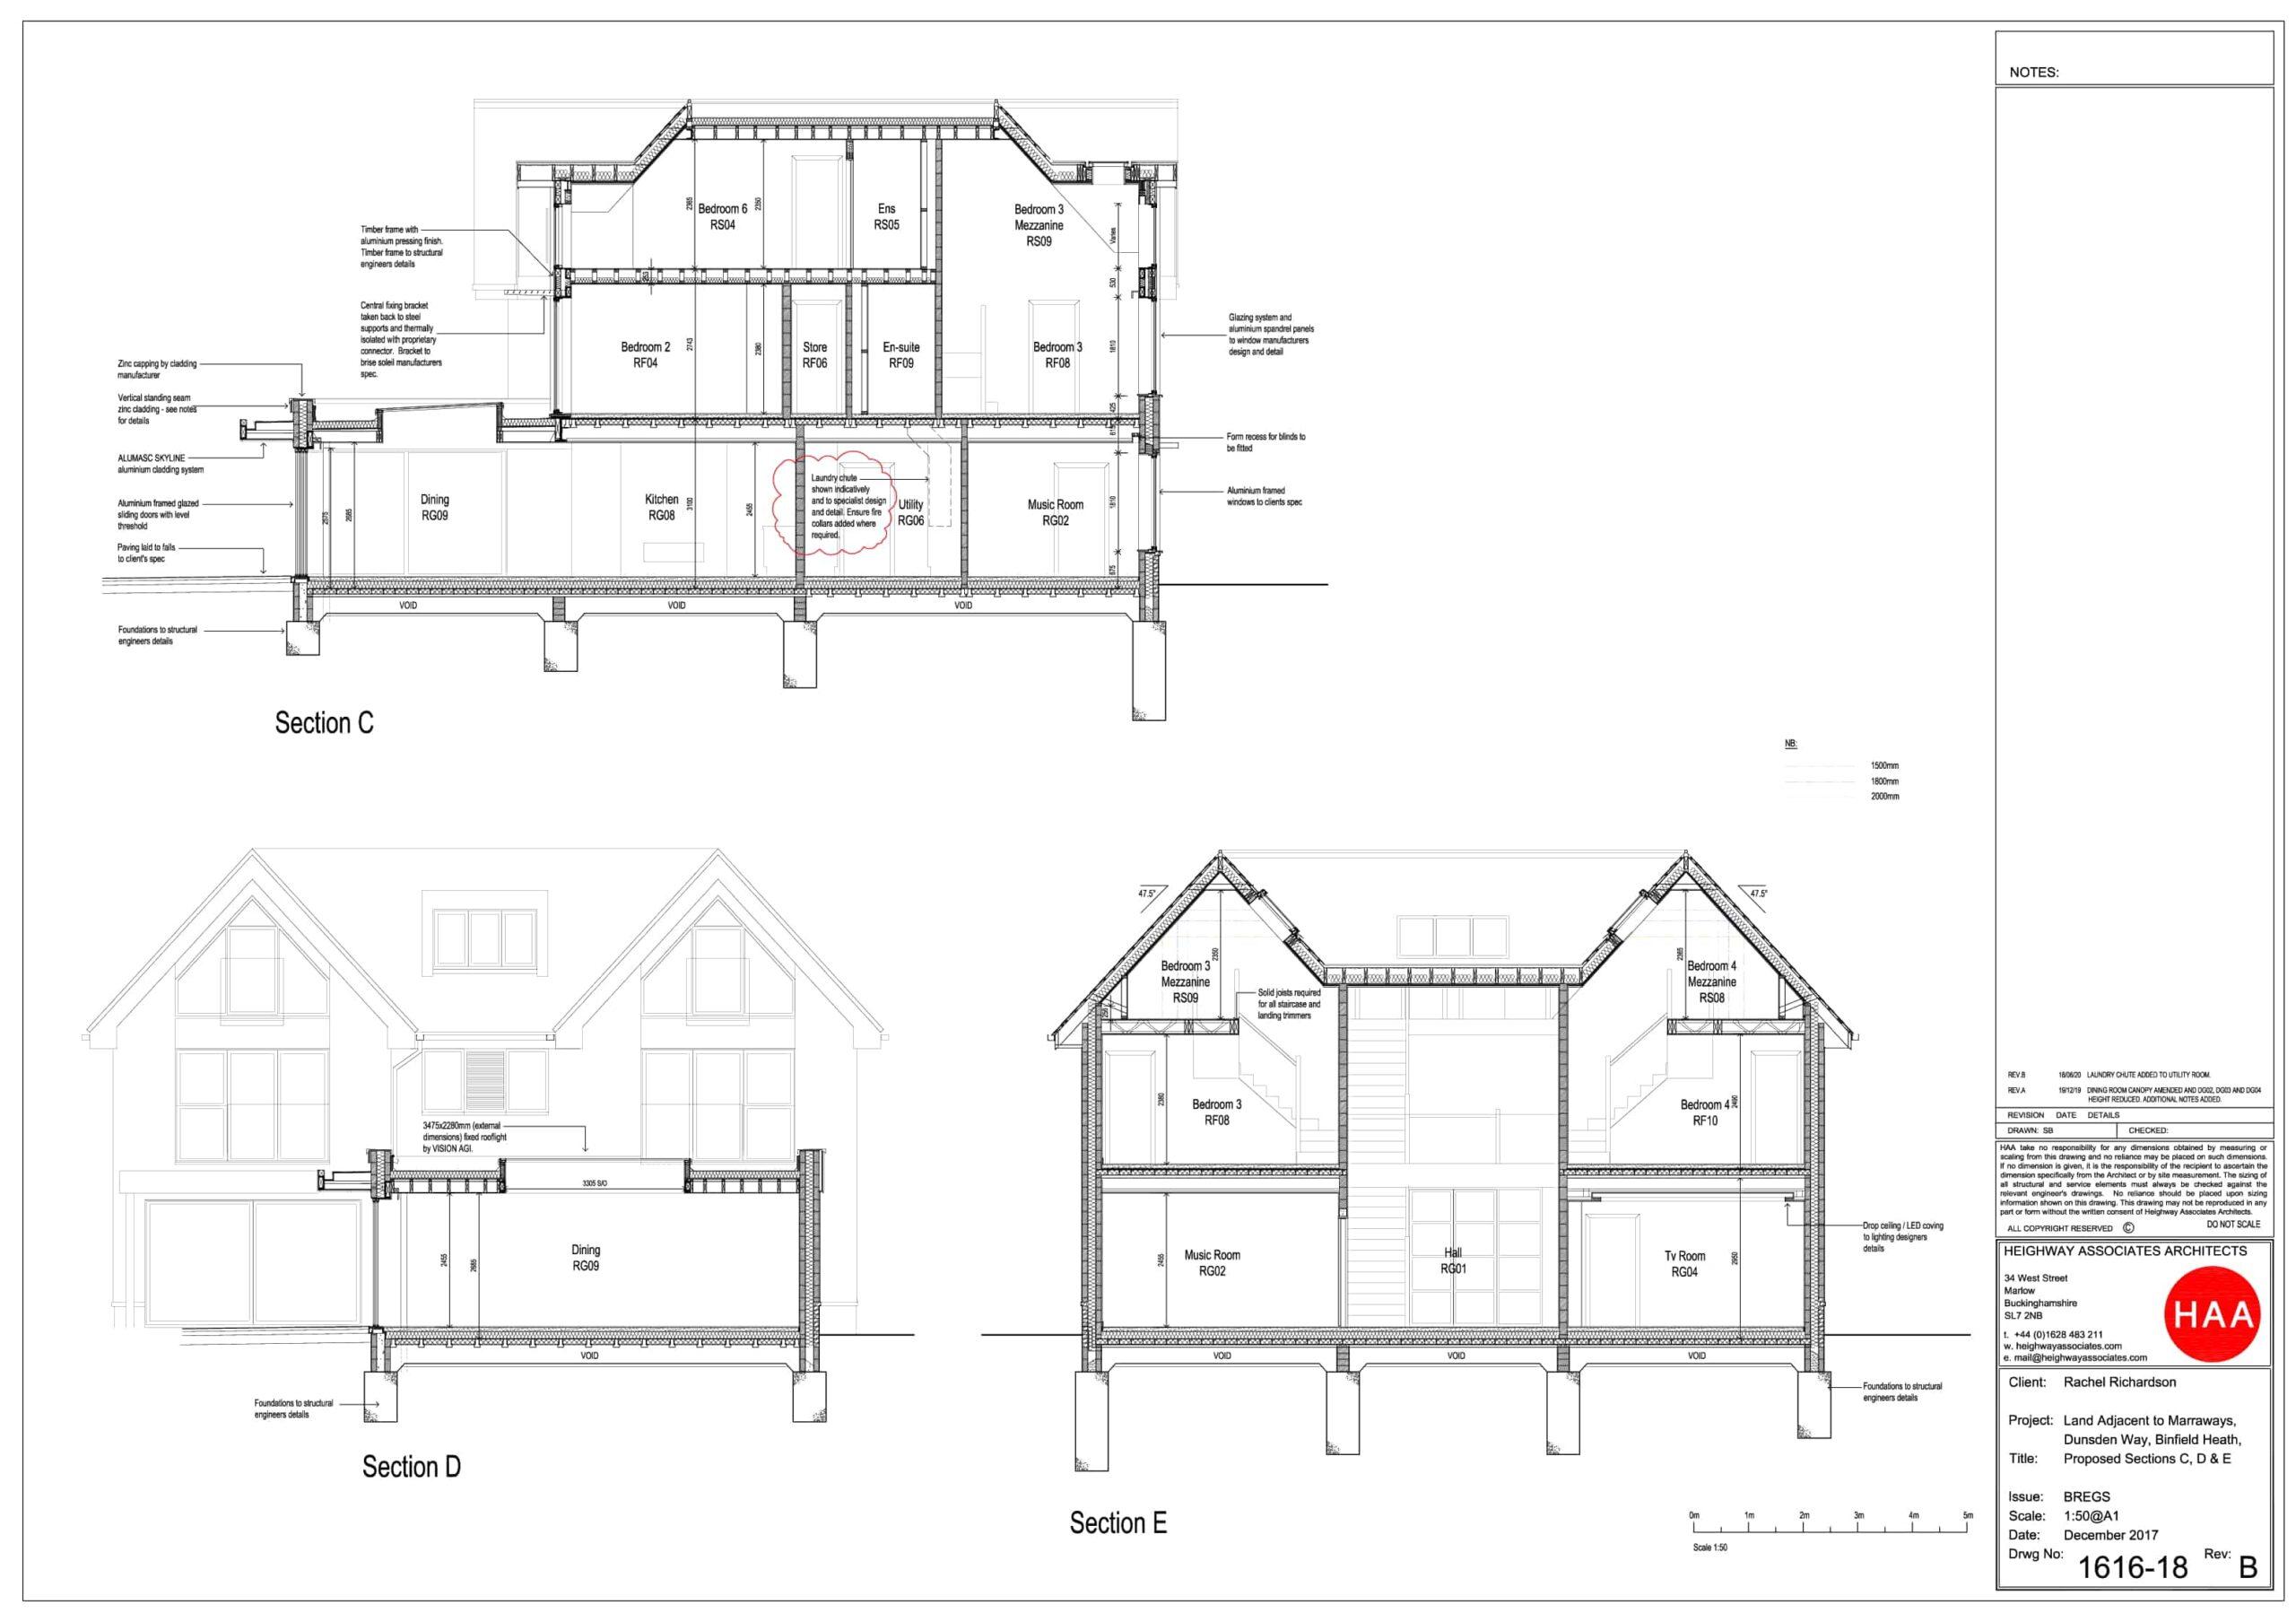 1616-18REVB Binfield Heath Section Drawing 2